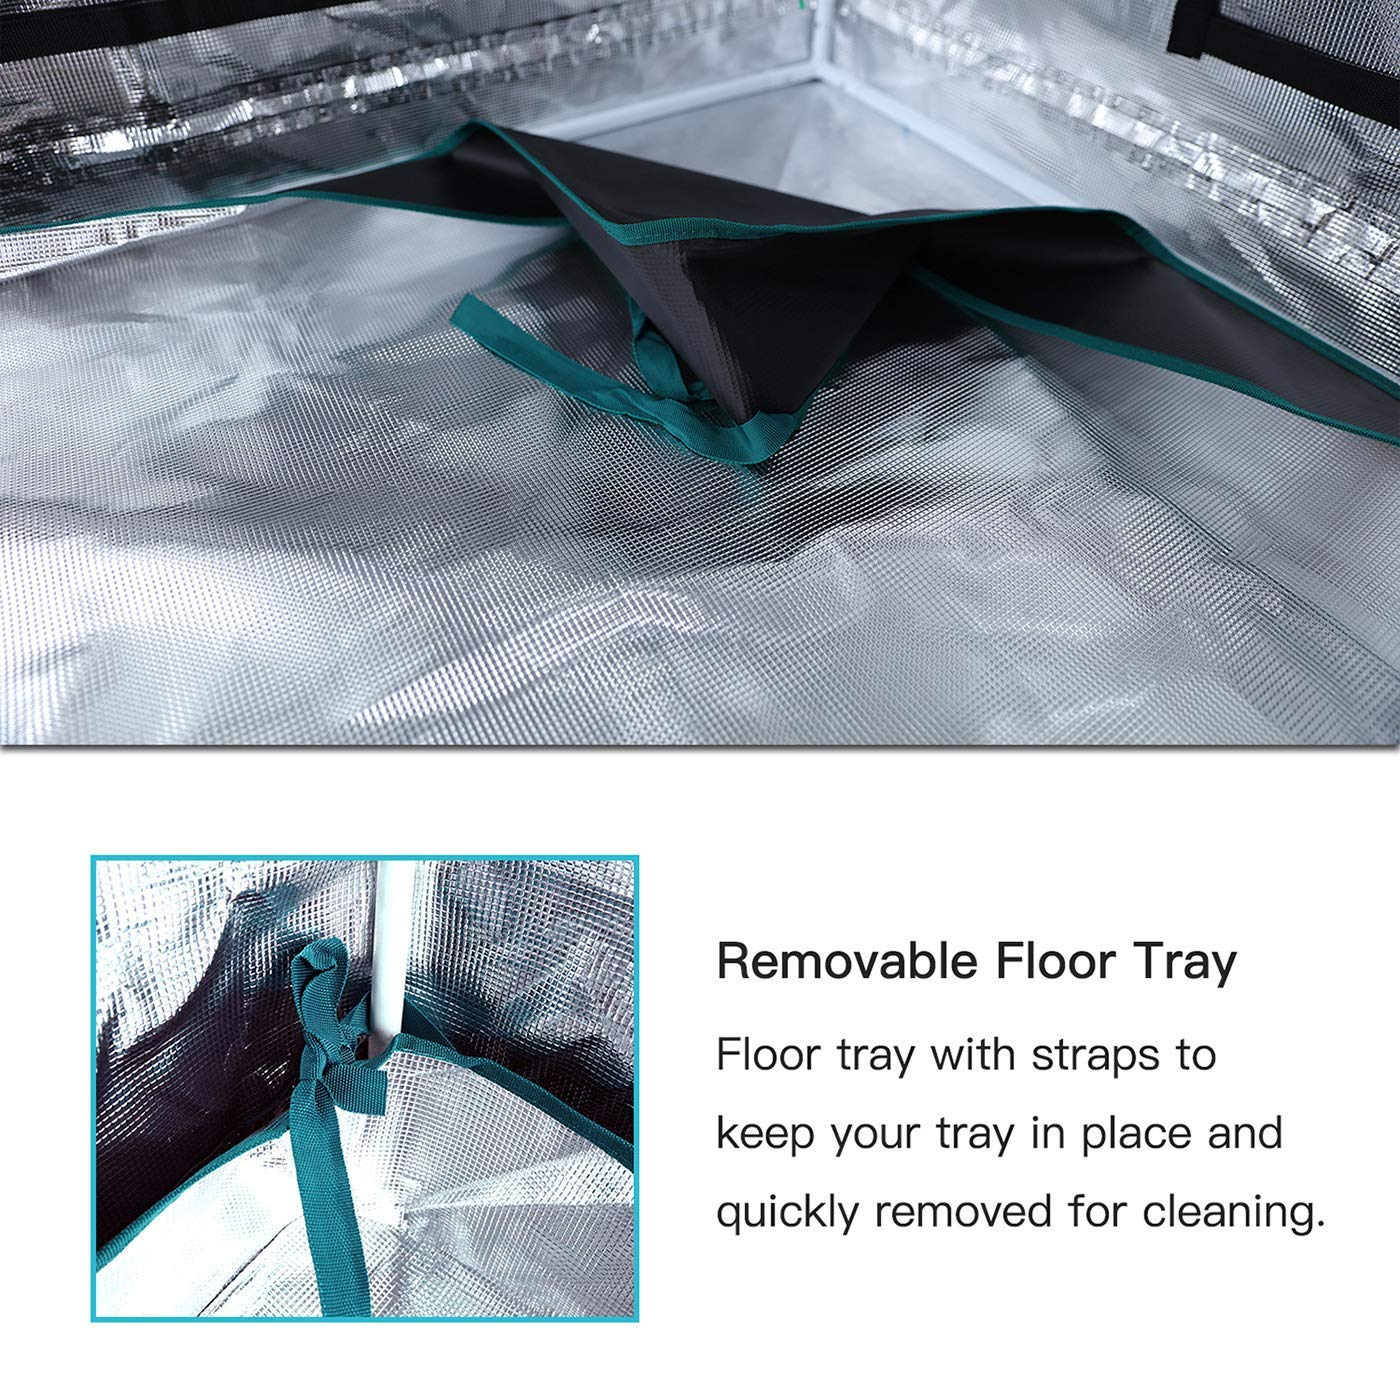 MARS HYDRO MarsHydro Grow Tent 39x39x70 Reflective Mylar Hydroponic Grow Tents for Indoor Plant Growing 3x3 39x39x70